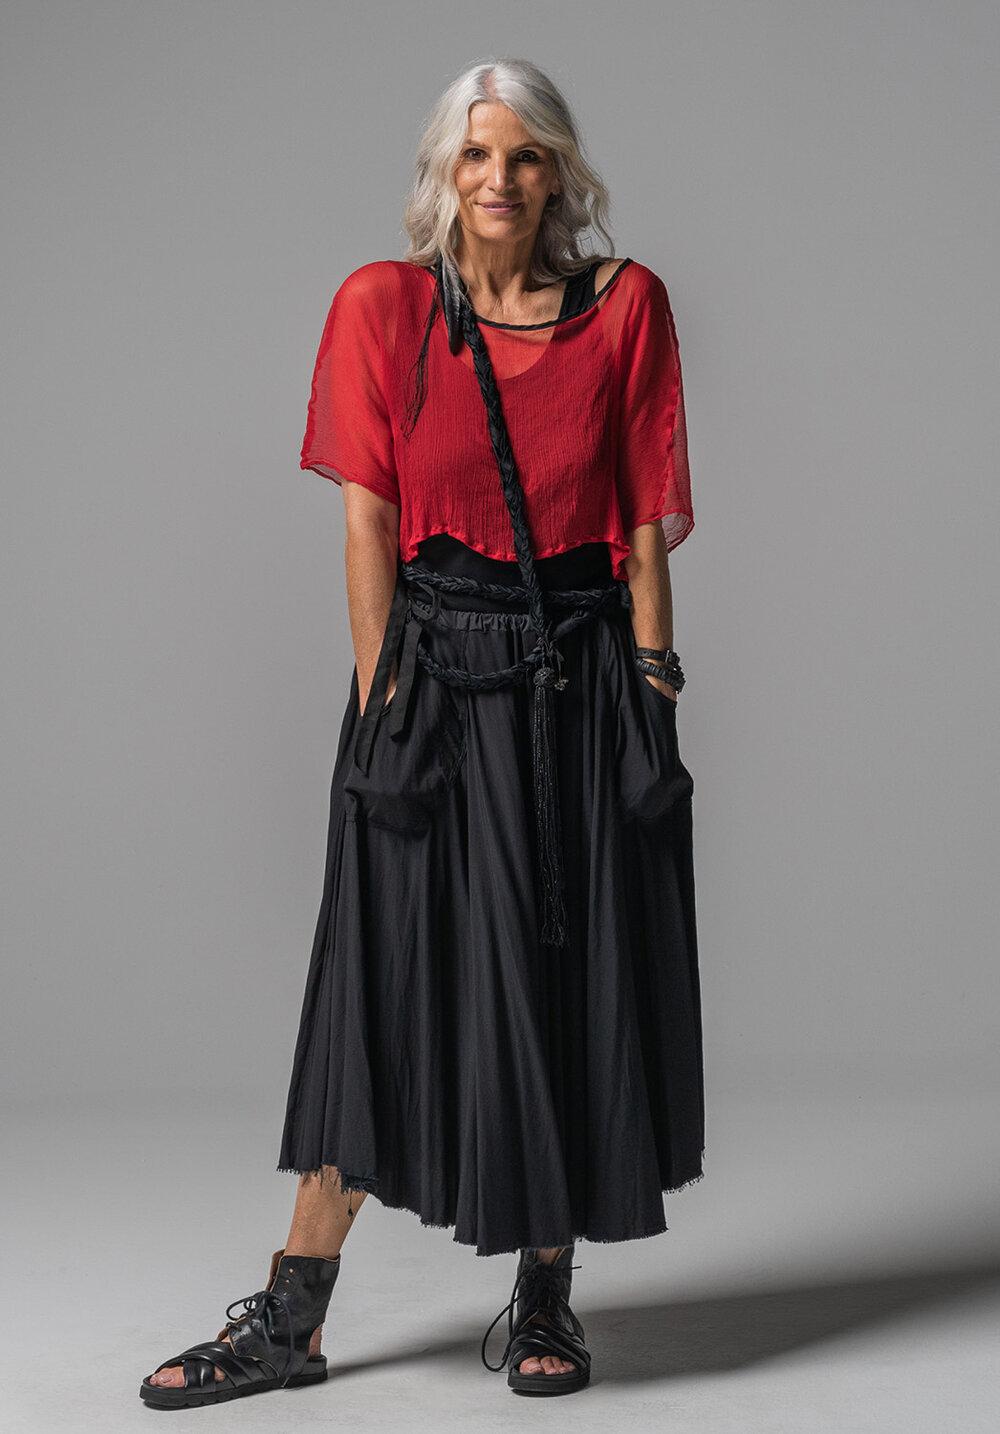 Archive top, Greta singlet + Mist midi skirt